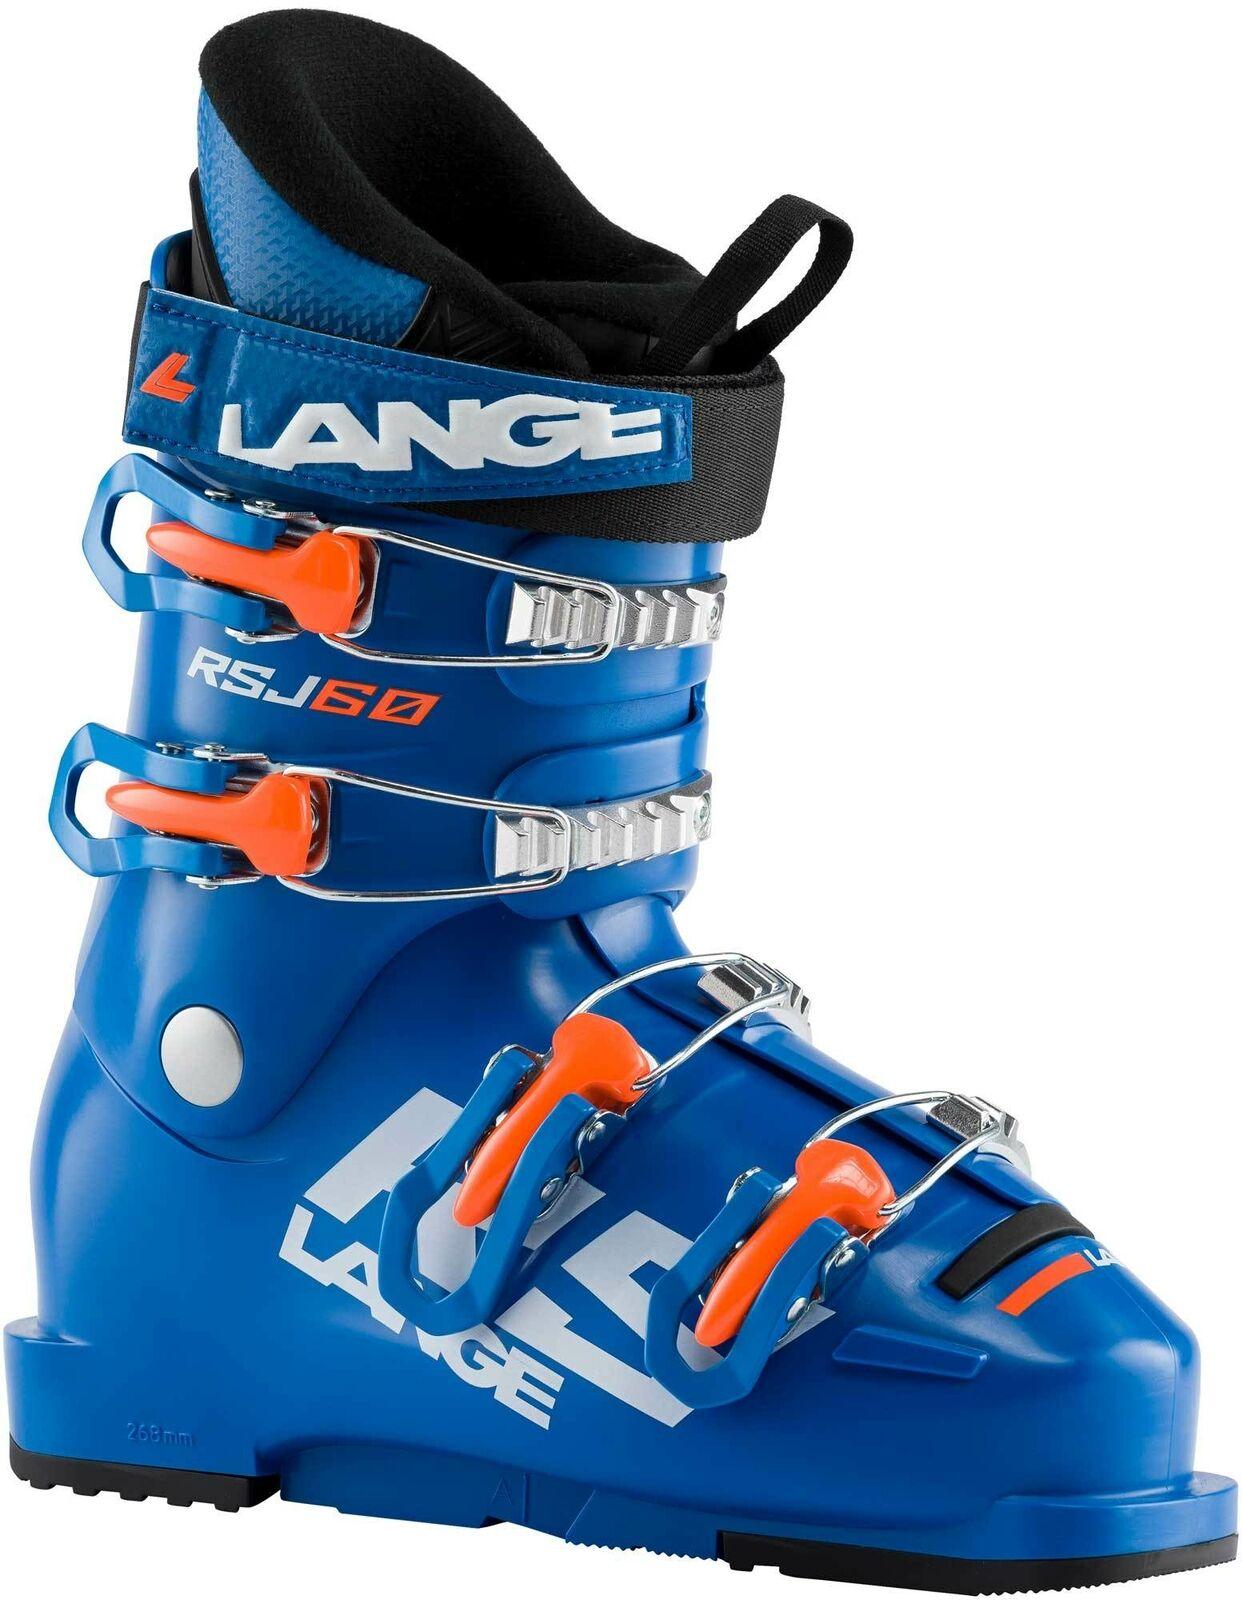 Lange RSJ 60 power blauw (2019 20) - Skischuhe (LBI5180)